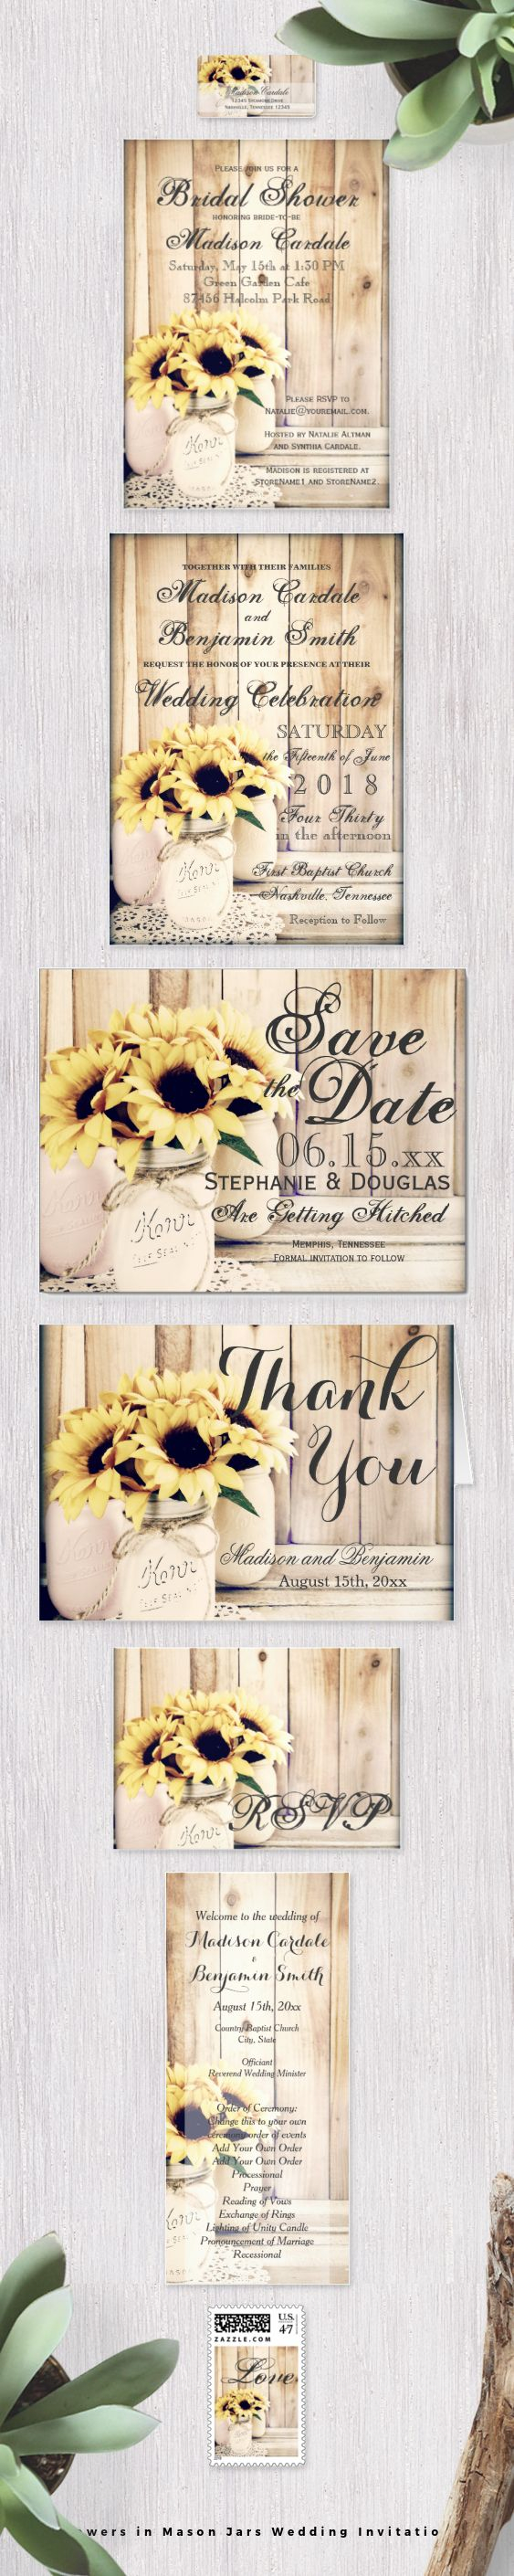 Mason Jar Wedding Invitation Kits Sunflowers In Mason Jars Wedding Invitation Set With Bouquets Of